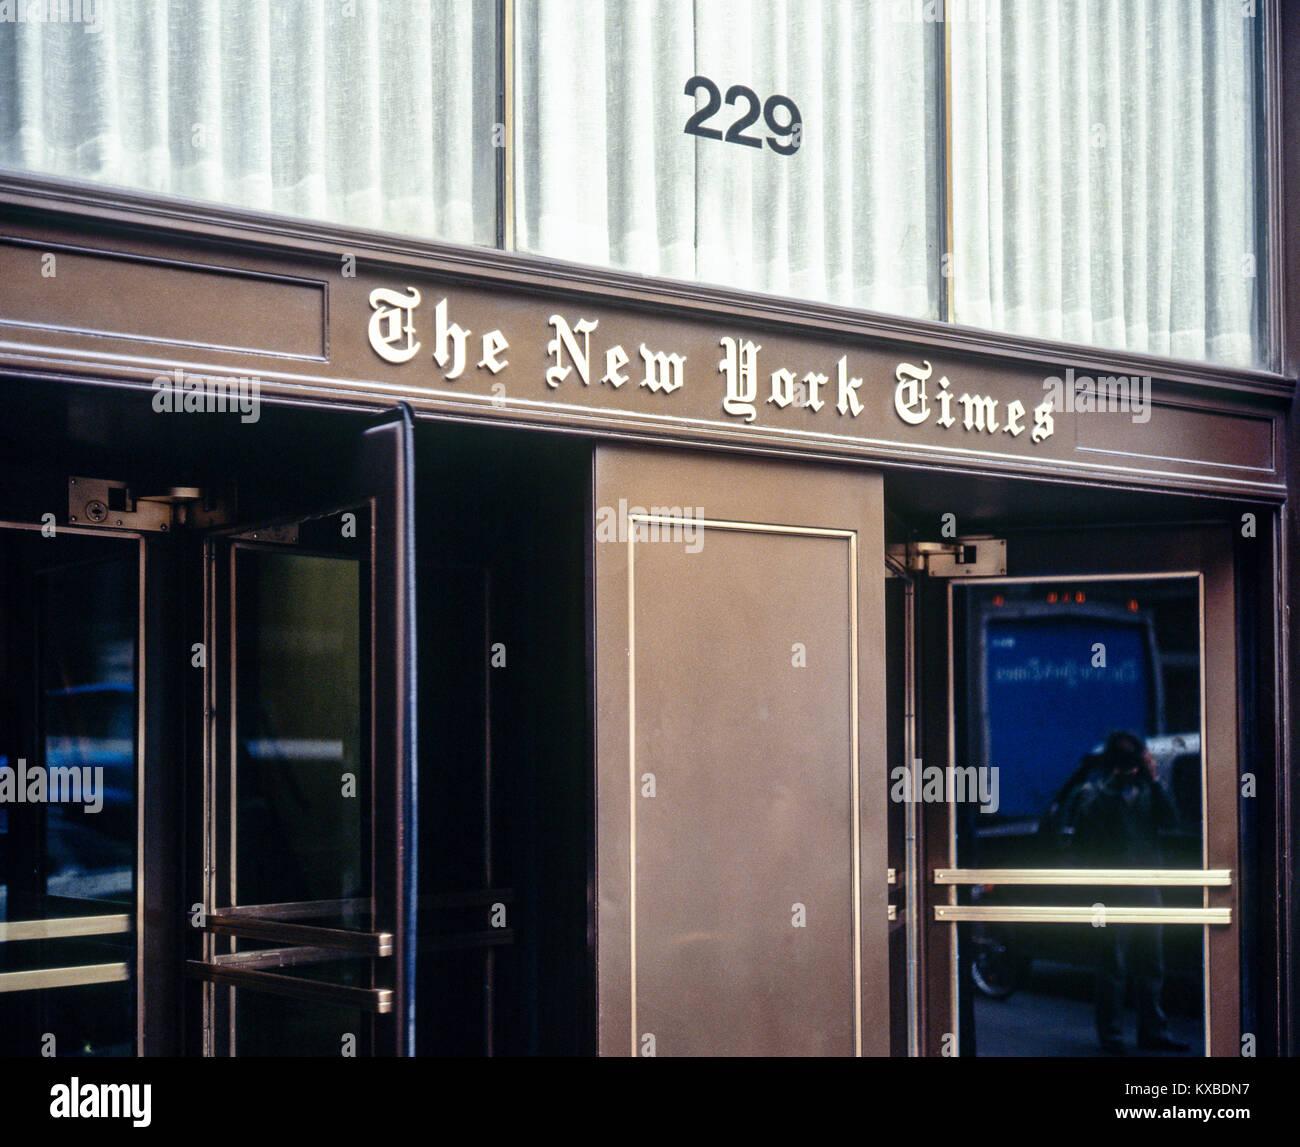 Mai 1982, New York, der New York Times Eingang, 229 West 43rd Street, Drehtüren, Manhattan, New York City, Stockbild